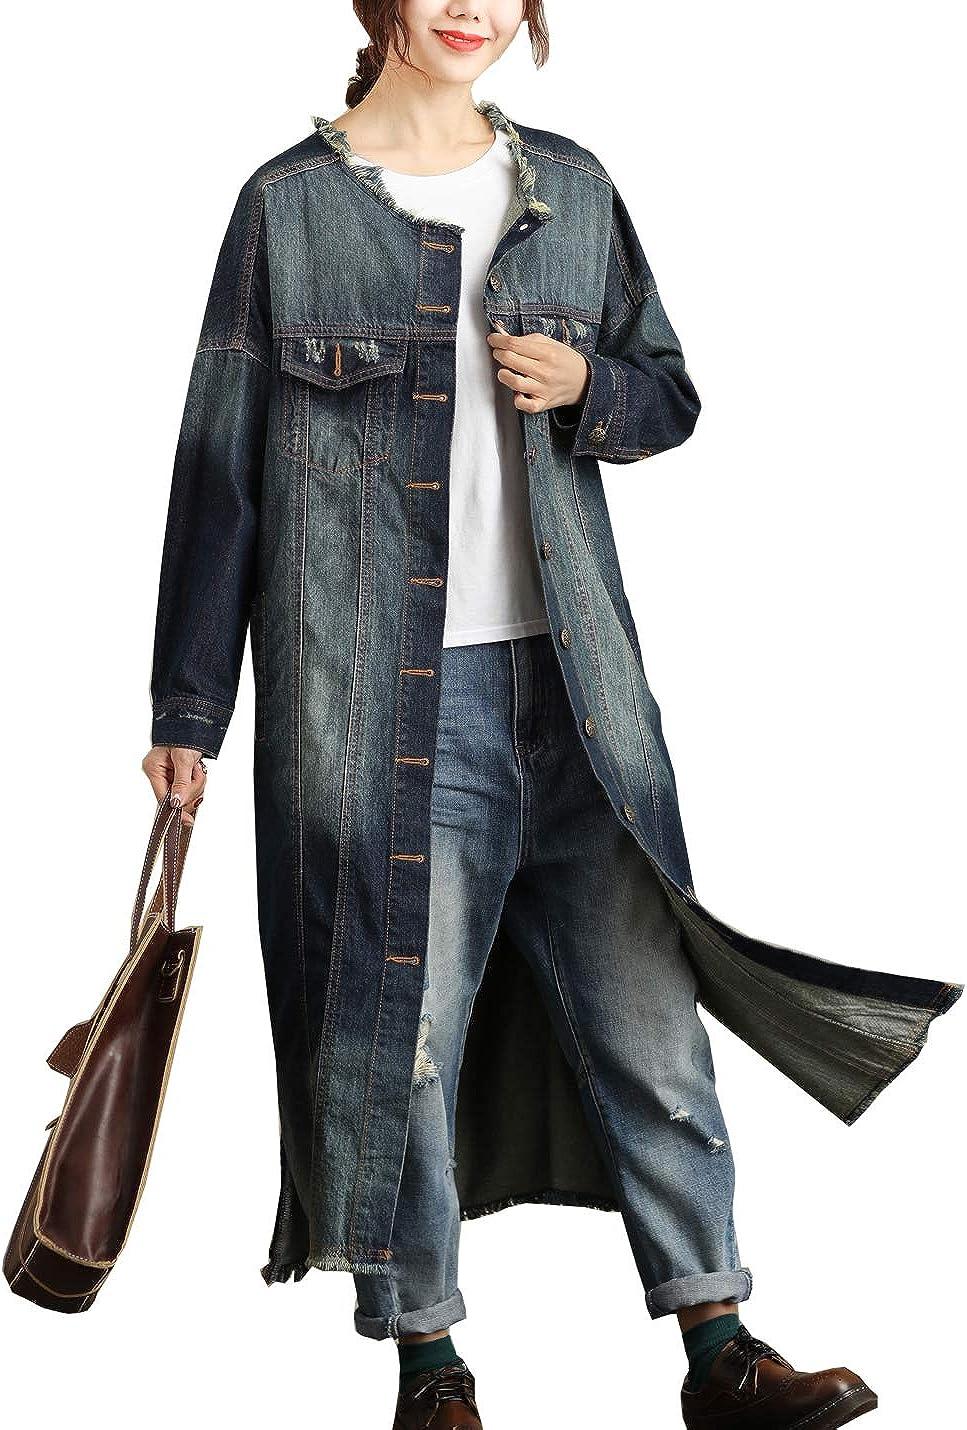 Flygo Women's Loose Fringed Crew Neck Long Denim Jacket Jean Coat